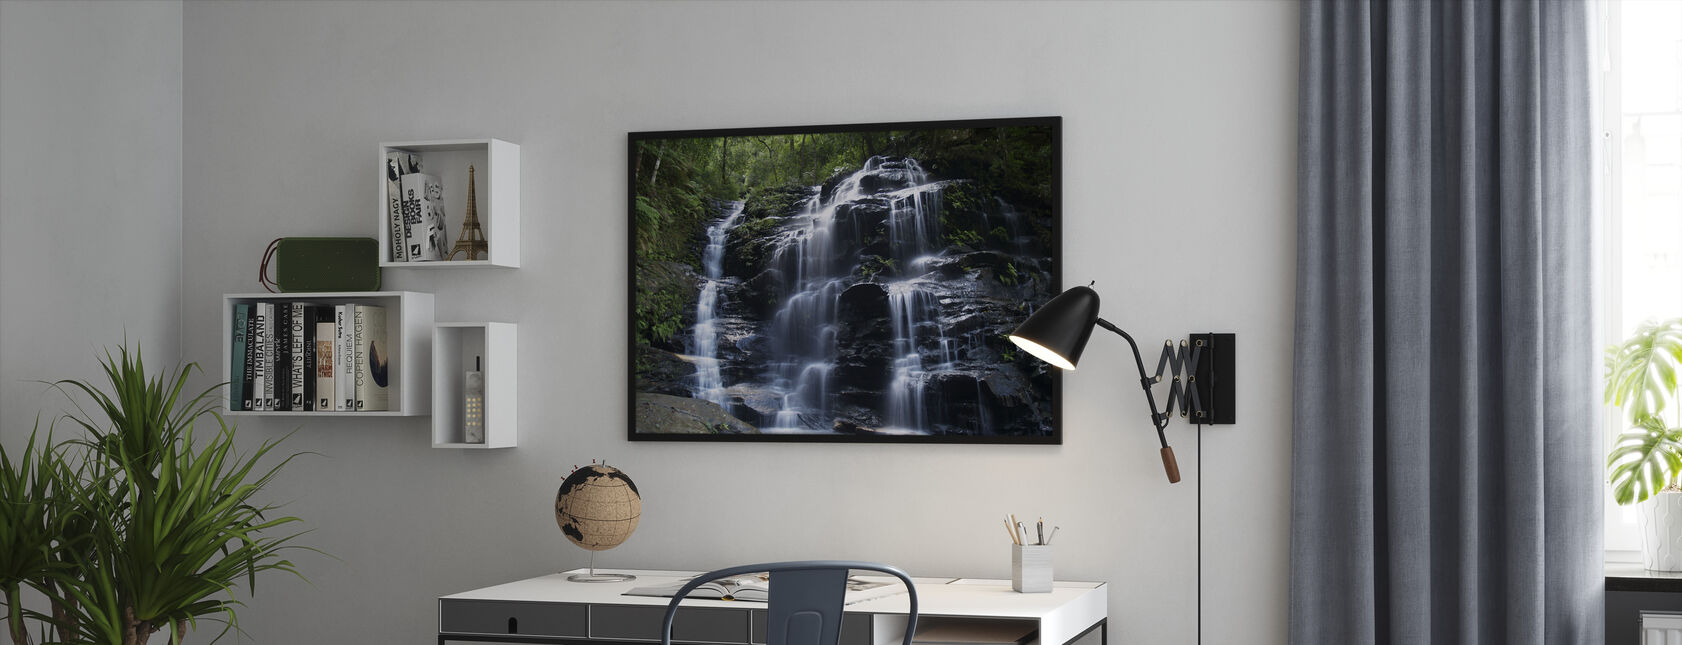 Amazon Waterfall - Framed print - Office